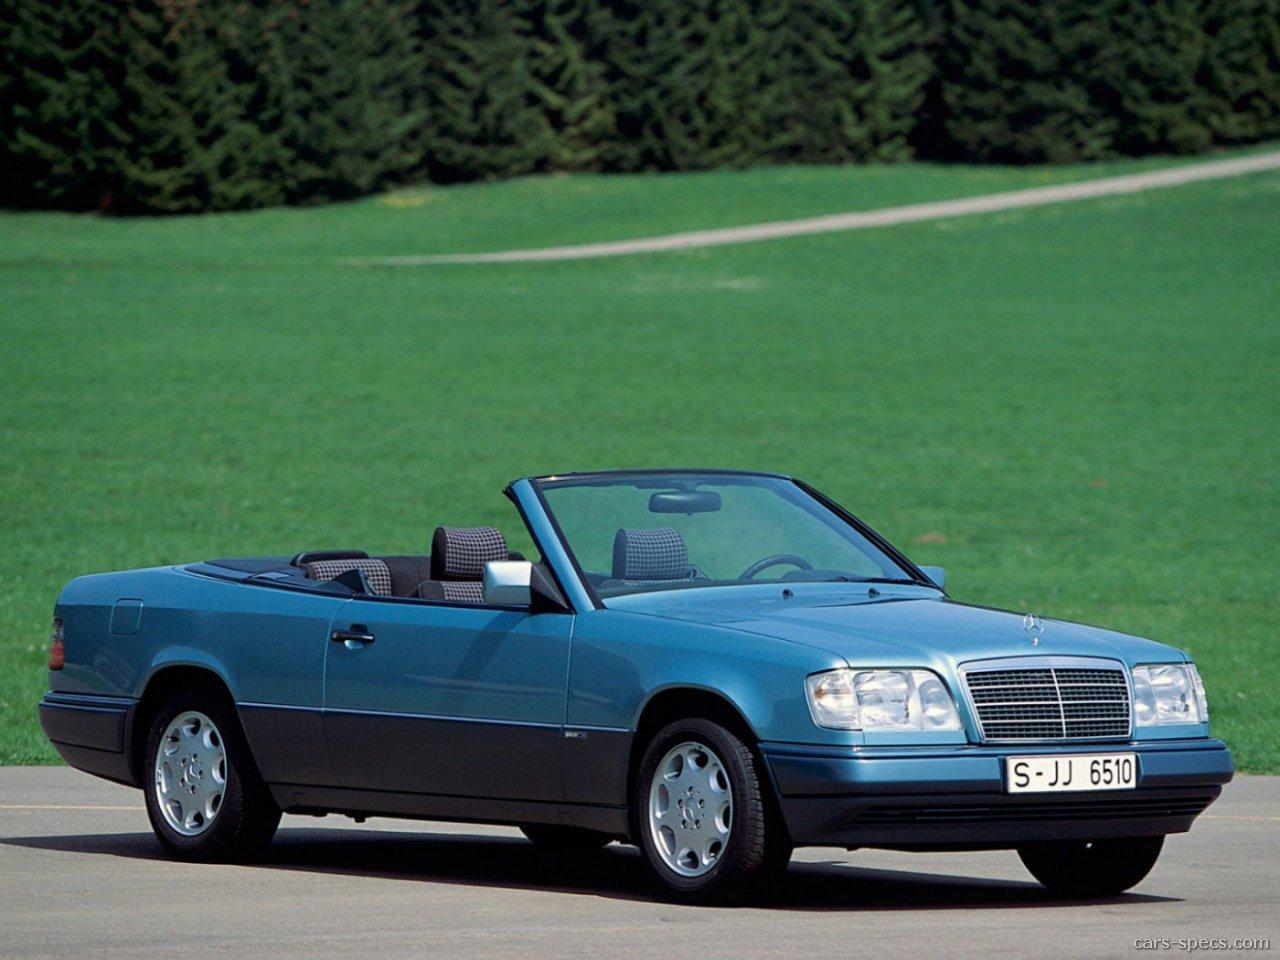 1995 mercedes benz e class convertible specifications for Mercedes benz e class 1995